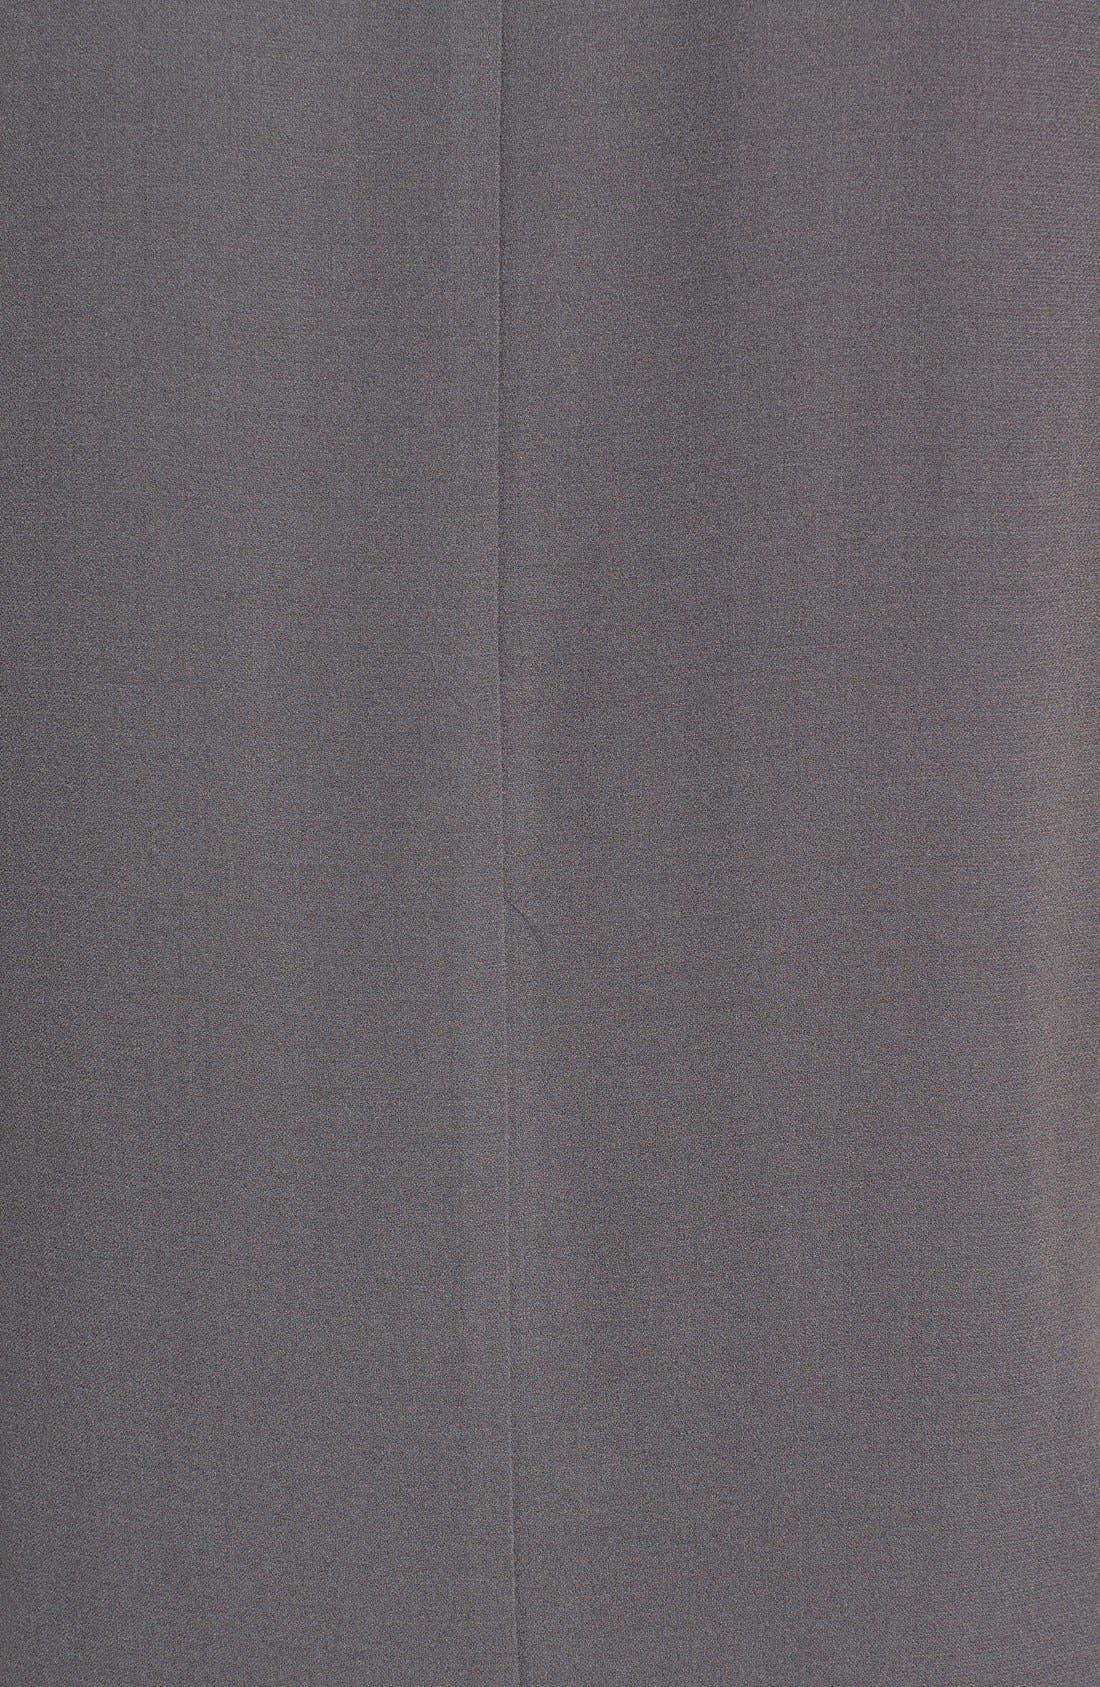 Silk Crepe High Neck Sleeveless Blouse,                             Alternate thumbnail 33, color,